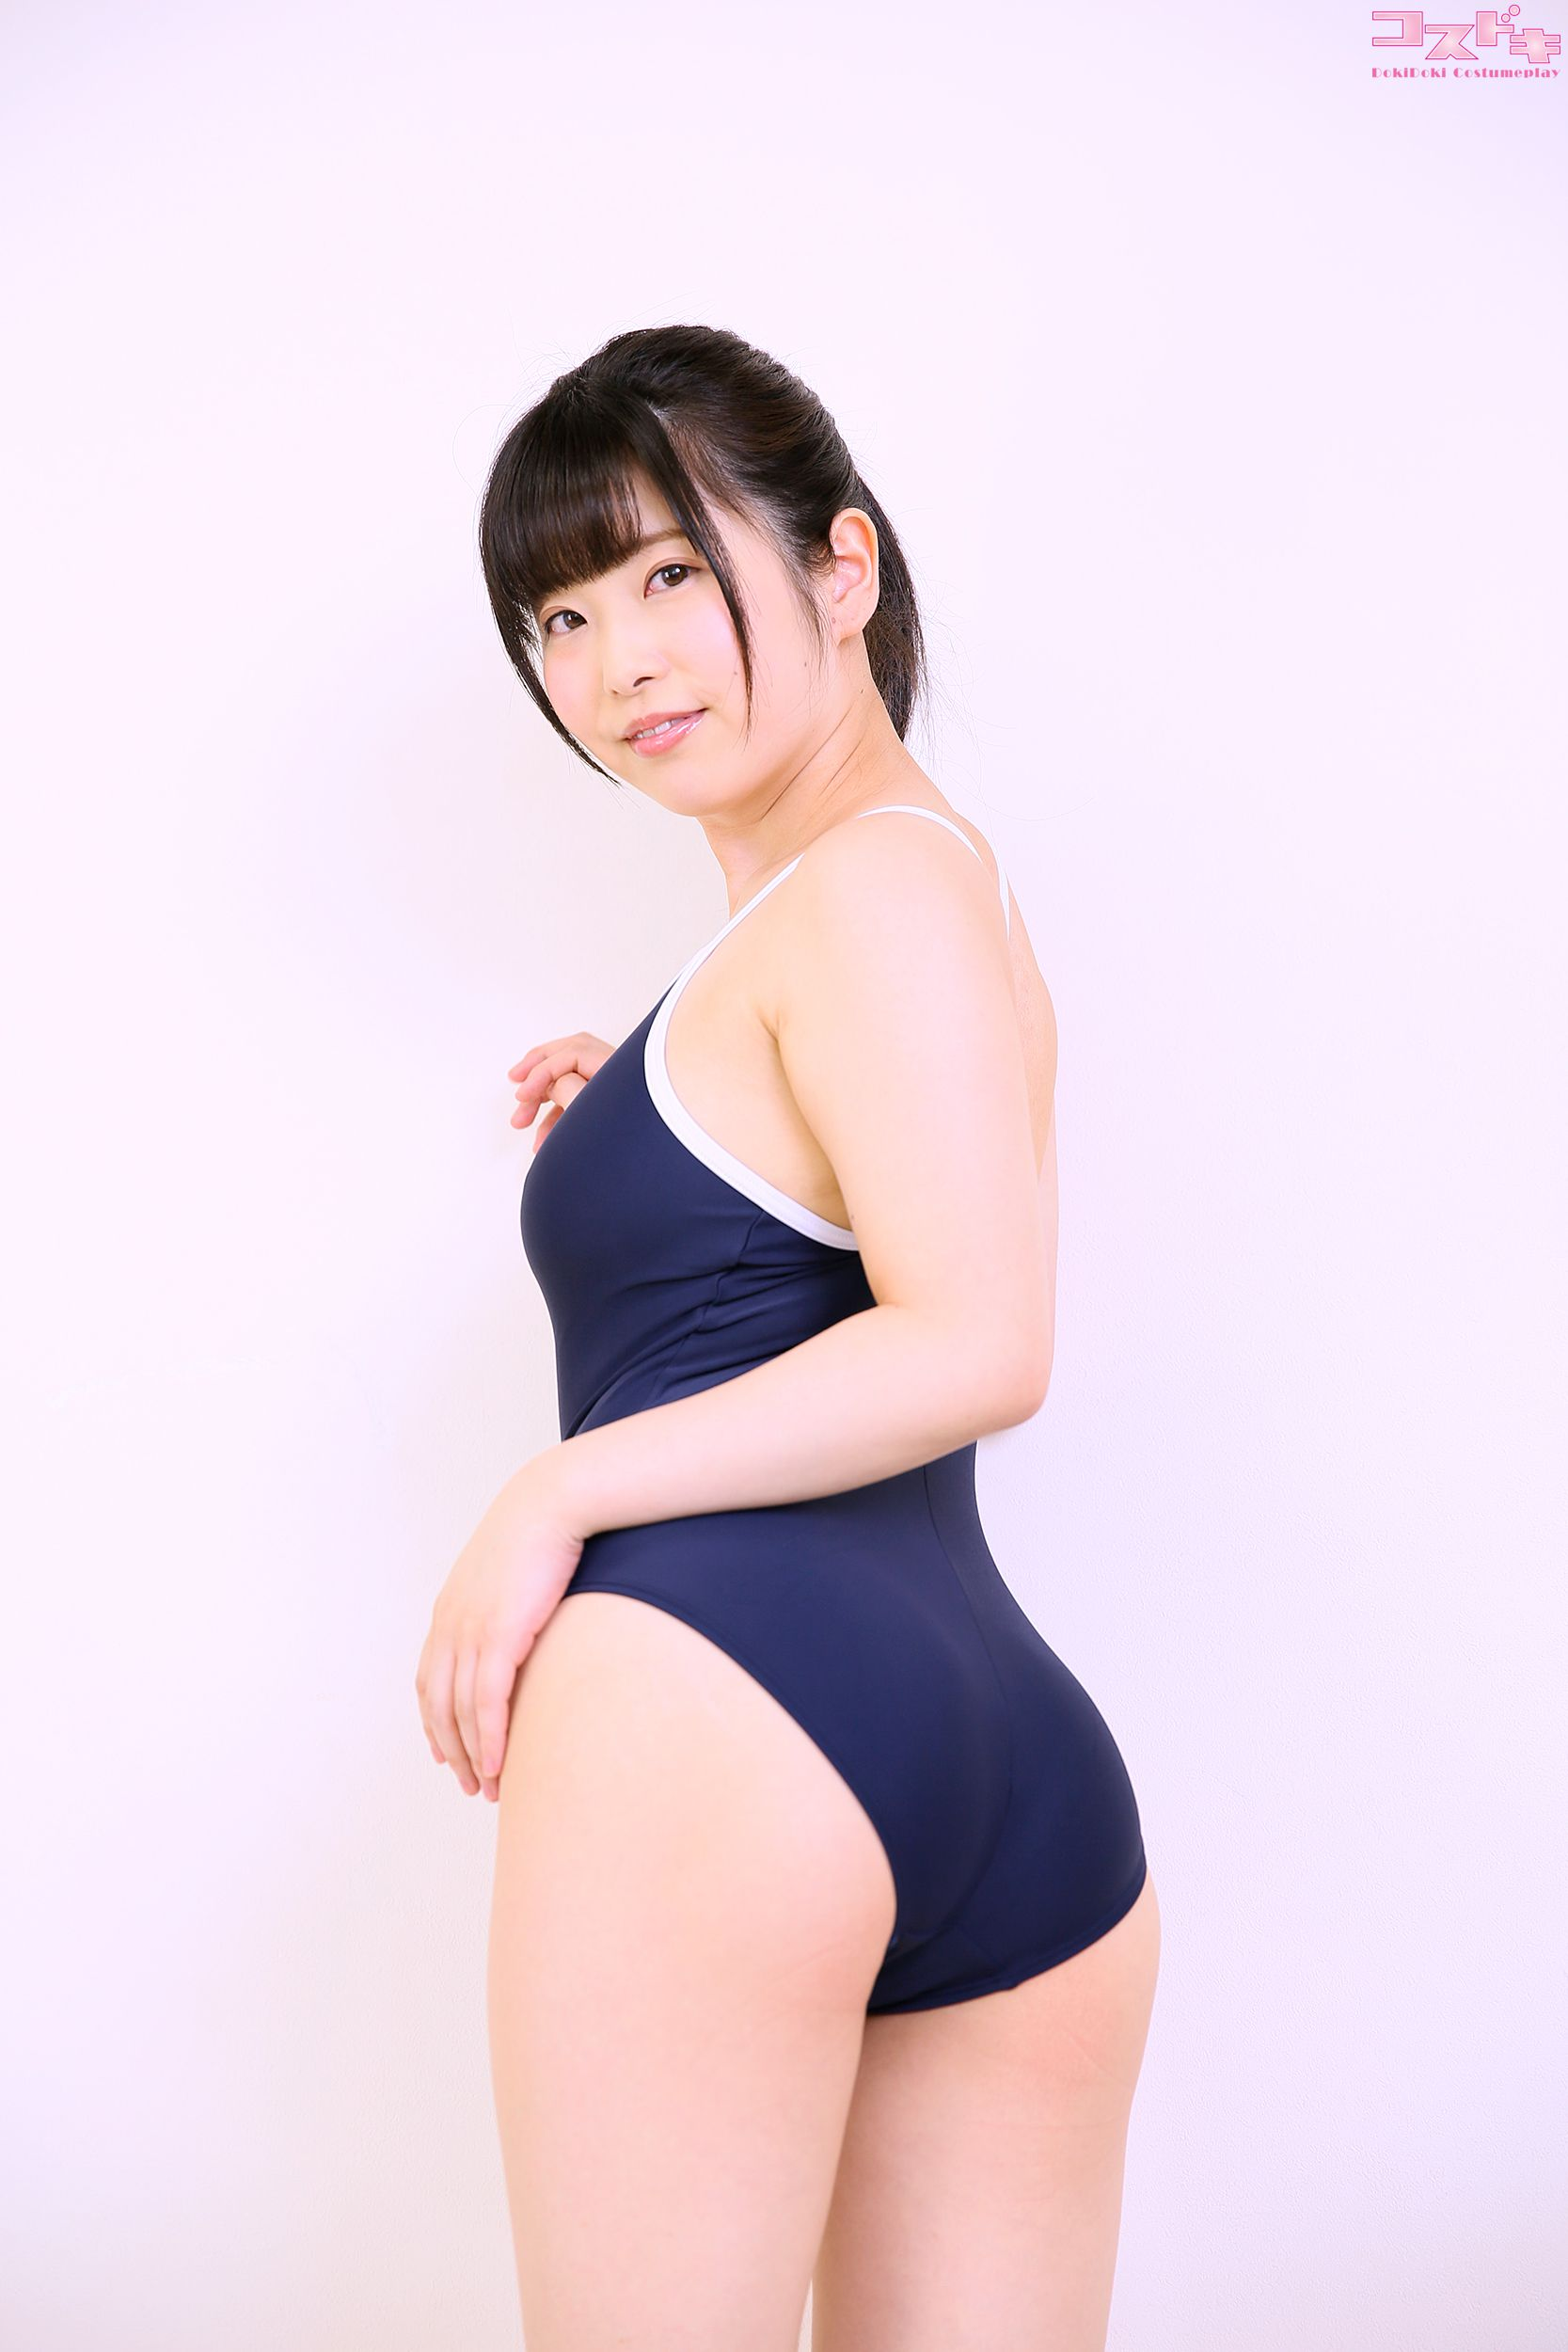 VOL.962 [Cosdoki]死库水:雏见怜(ひなみれん)超高清写真套图(43P)